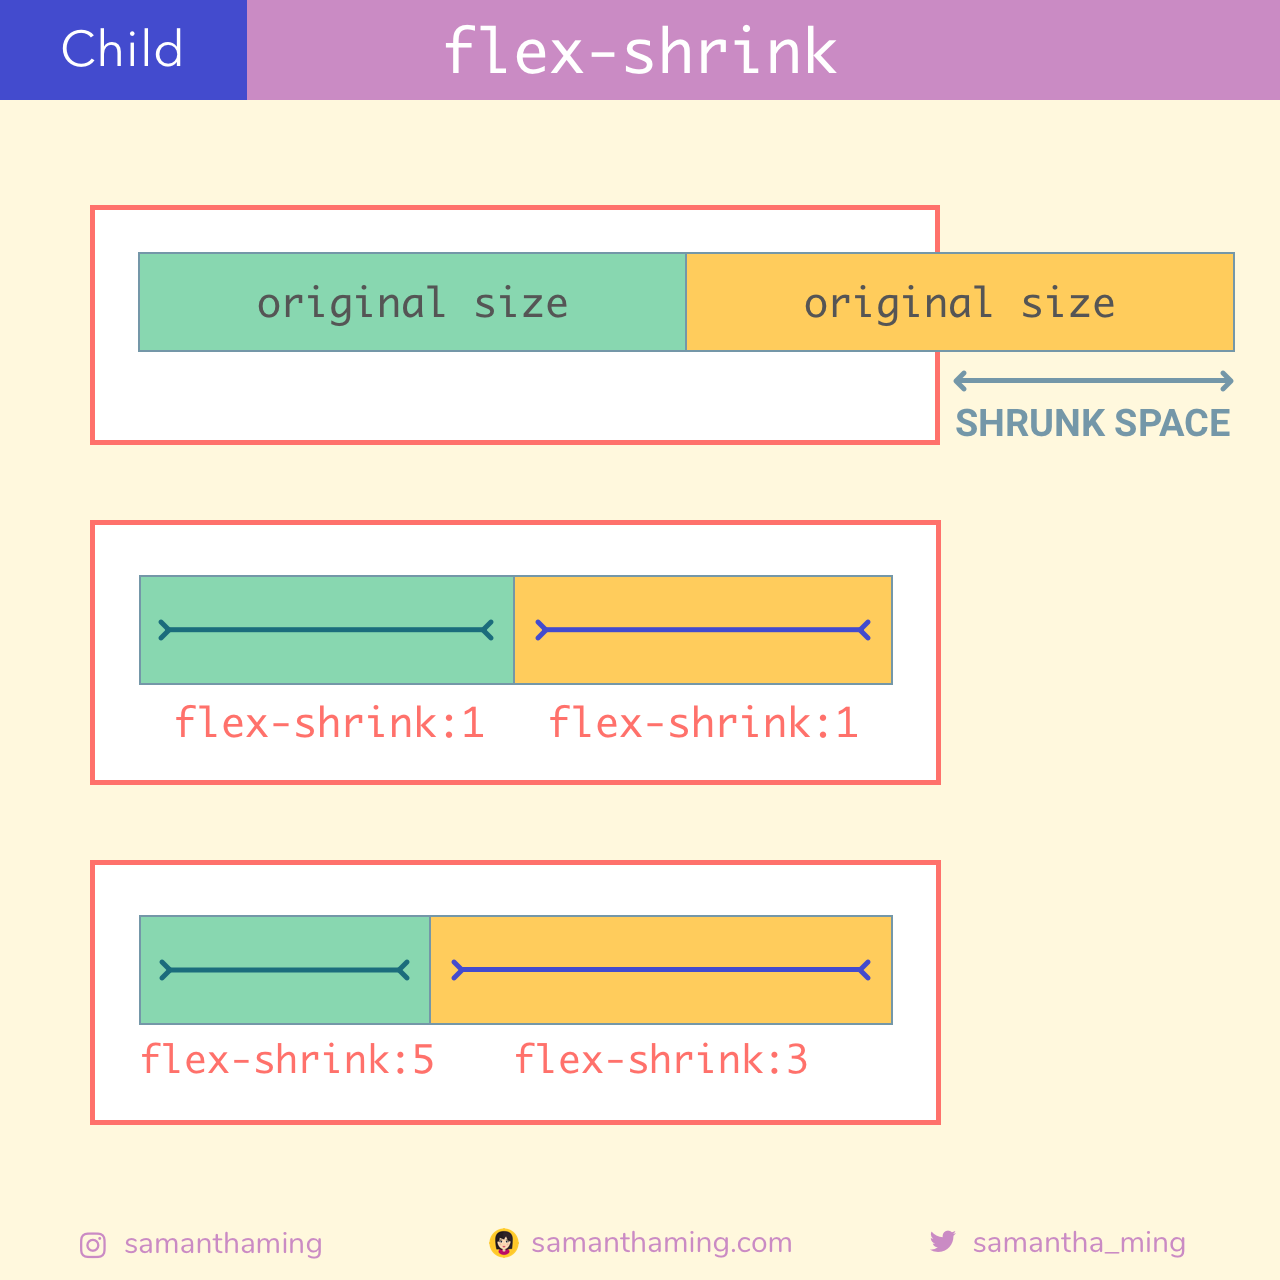 flex-shrink